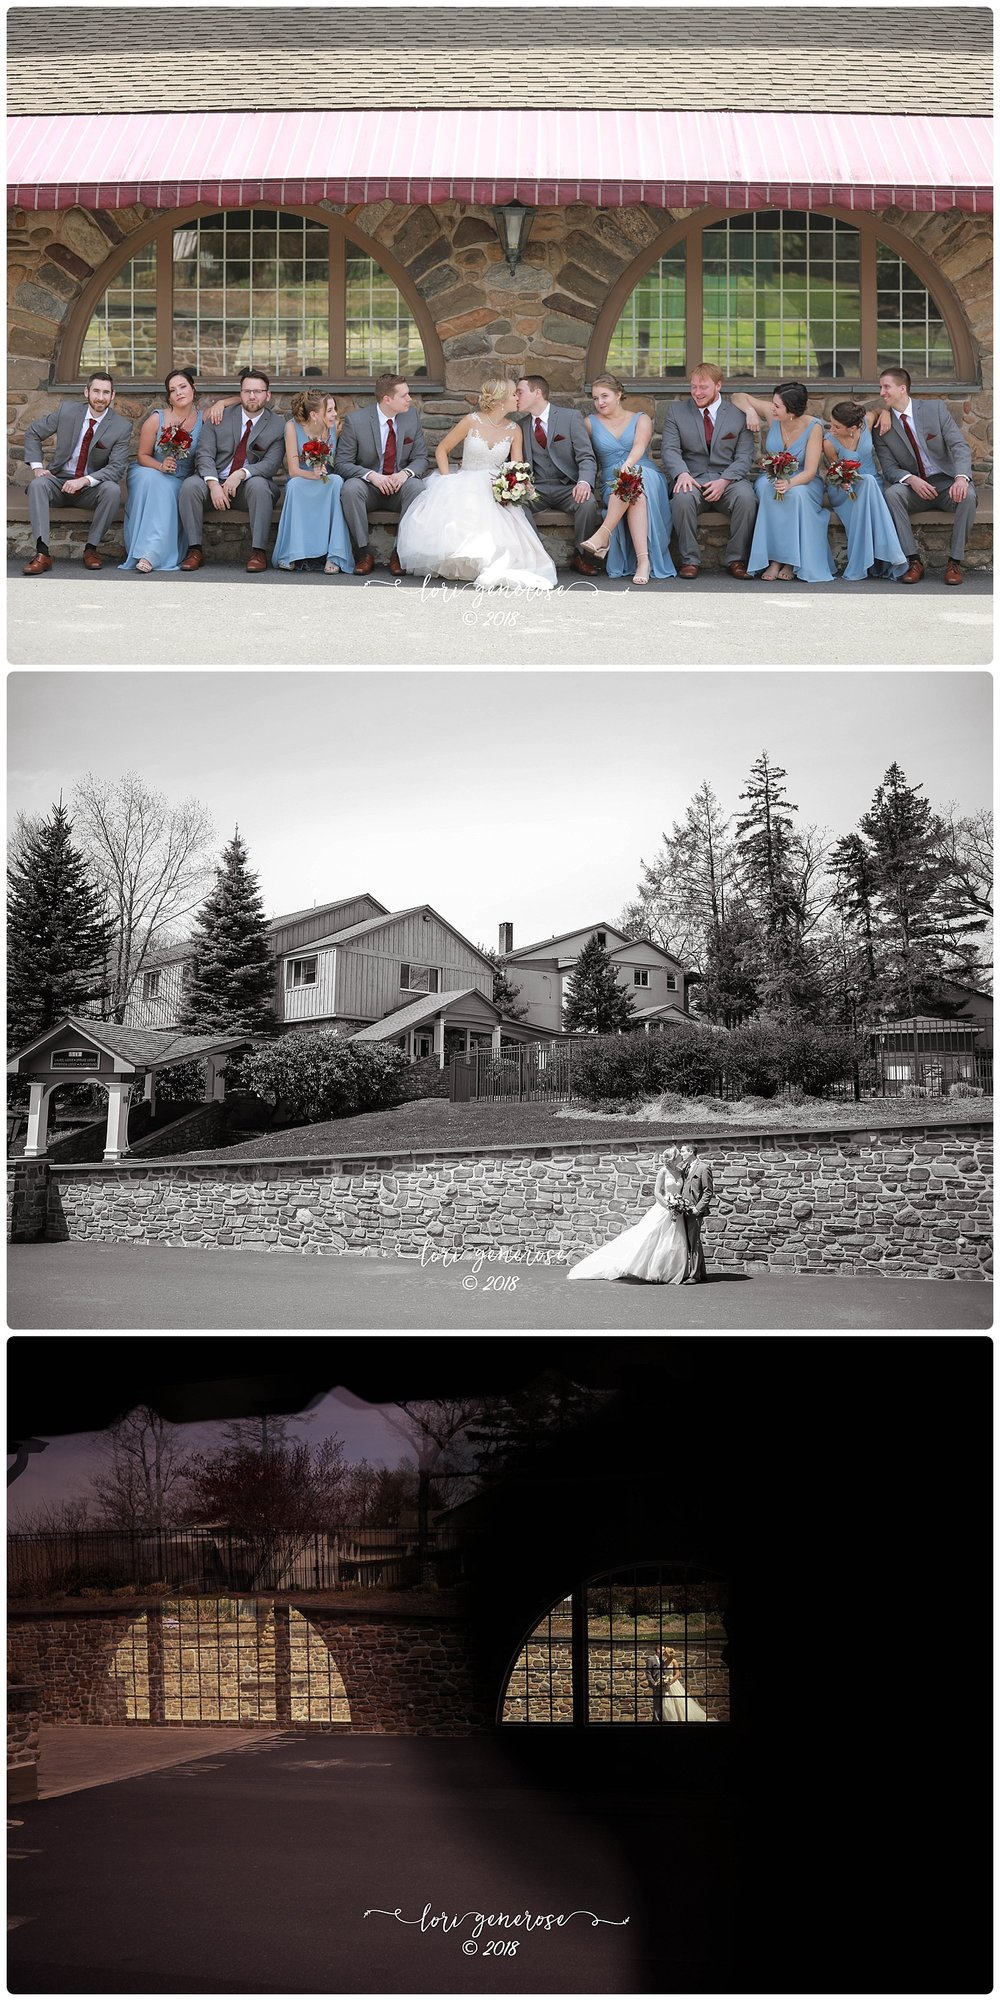 lgphotographylorigenerosetheinnatpoconomanorpaweddingvenuebridalpartybridegroom.jpg